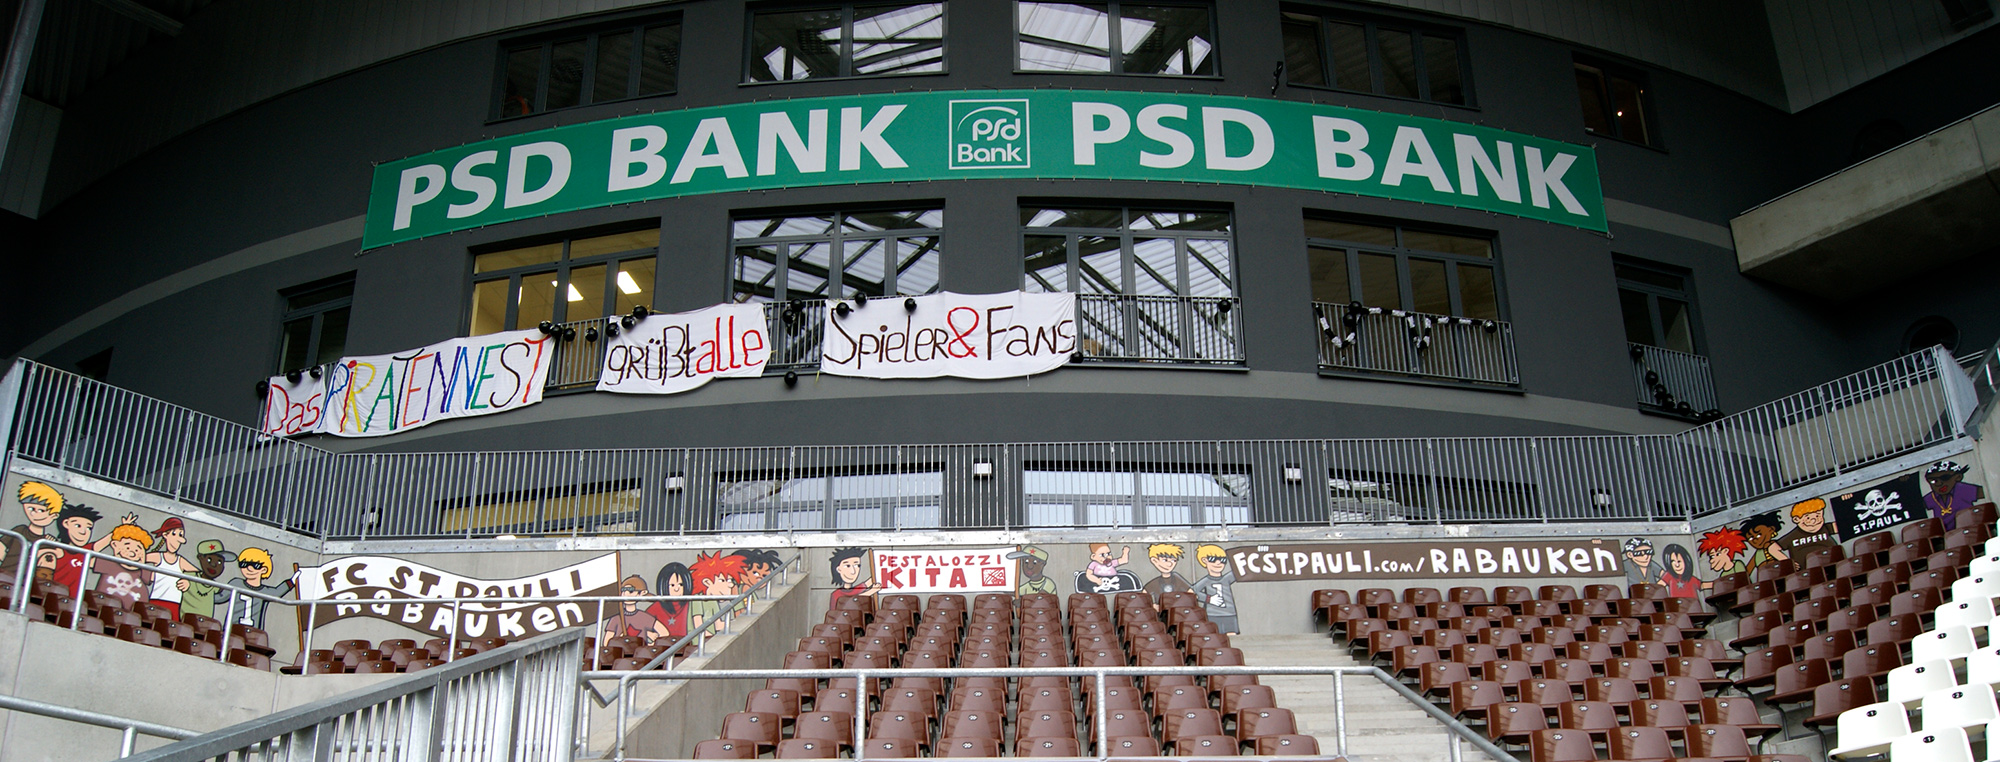 St. Pauli Graffiti - Fassadengestaltung im Fußball Stadion